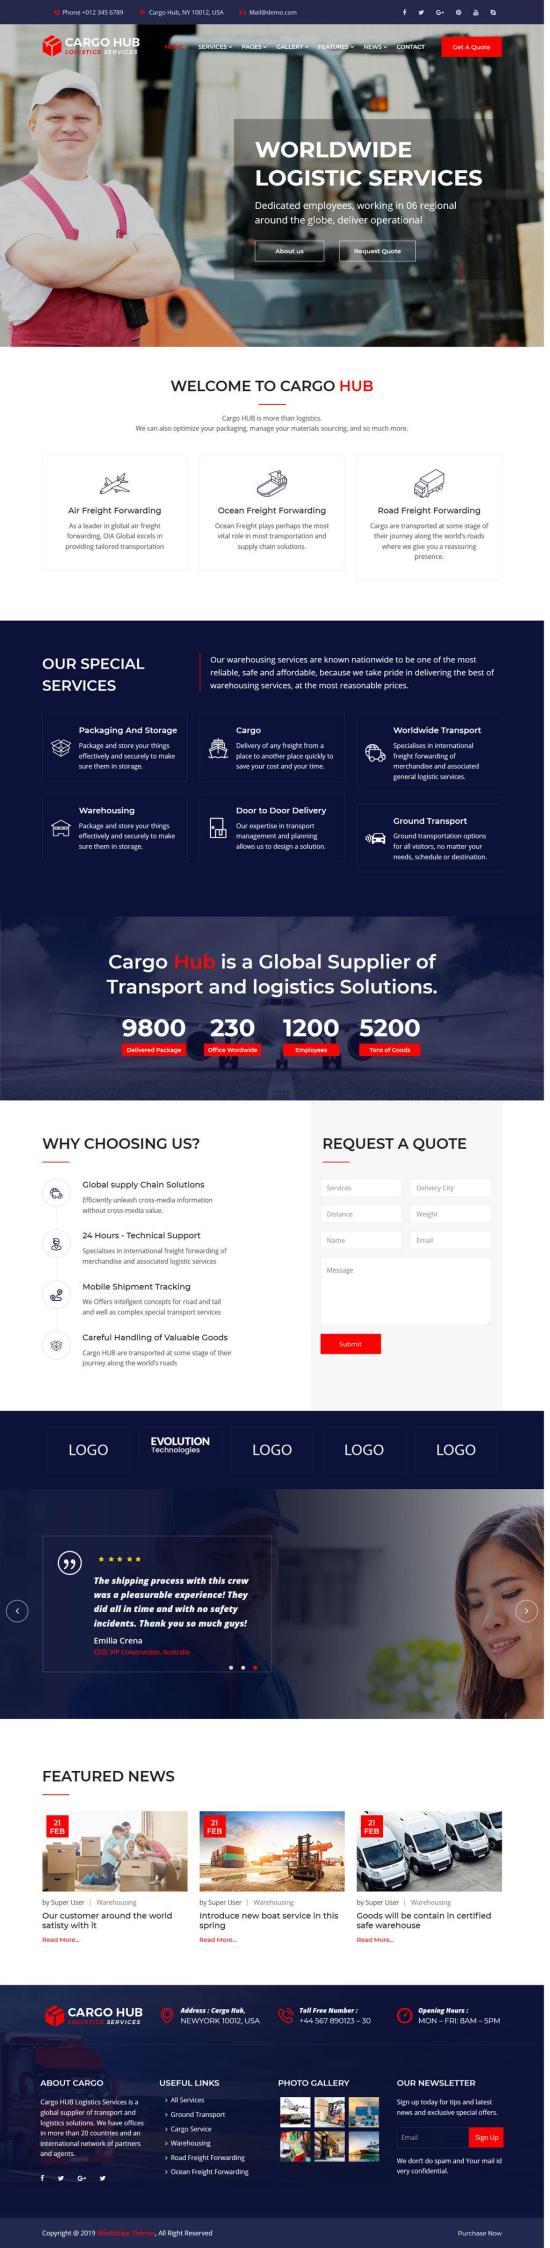 Cargo HUB Joomla Template Preview